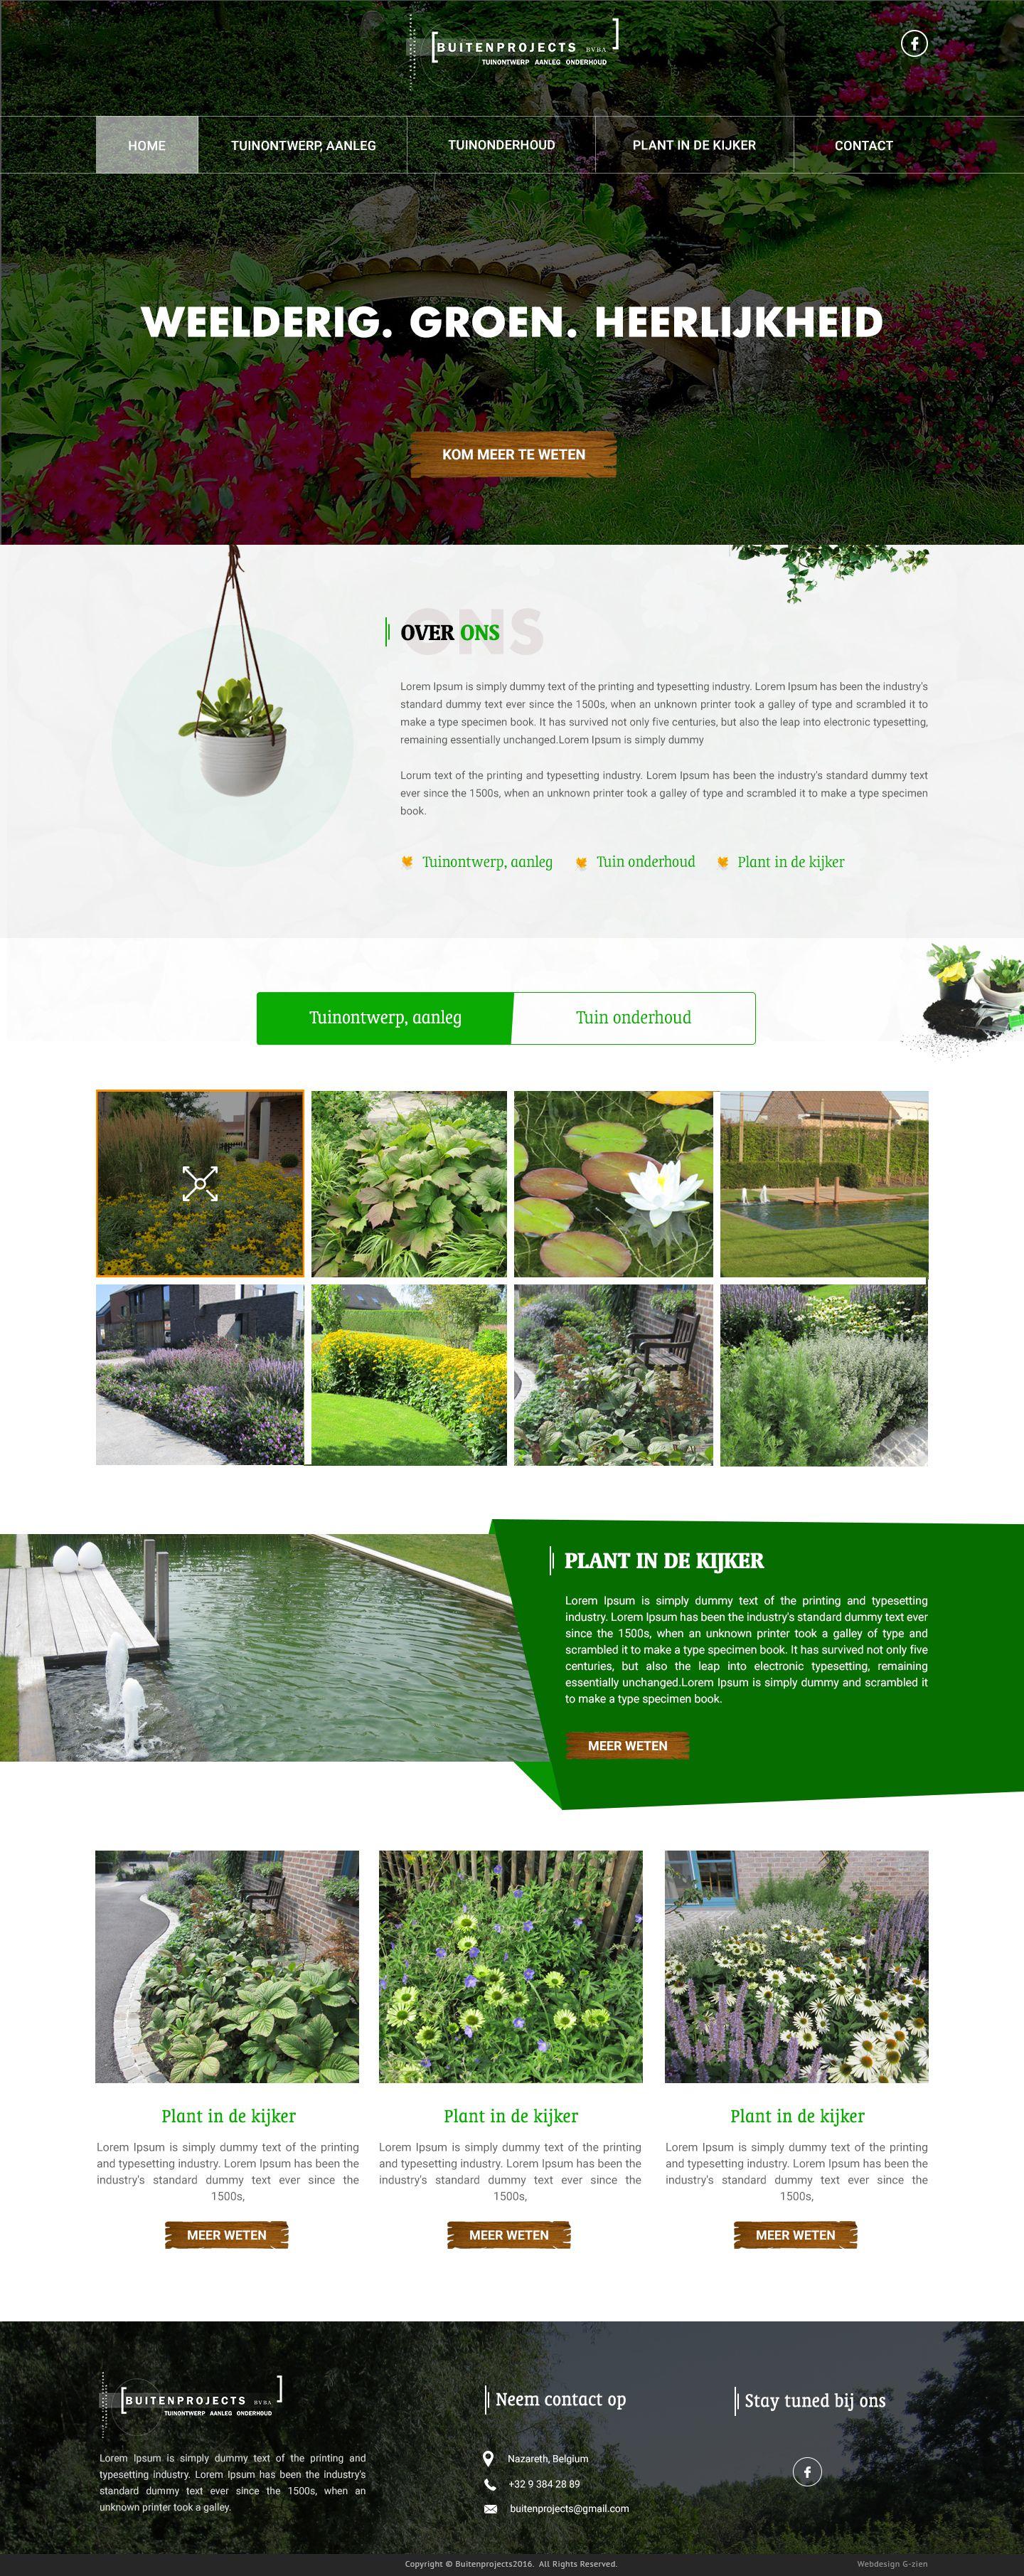 The Best Gardening Website Inspiration By 42works That Also Includes Website Designing Web Graphic Design La Garden Design Layout Garden Layout Garden Design